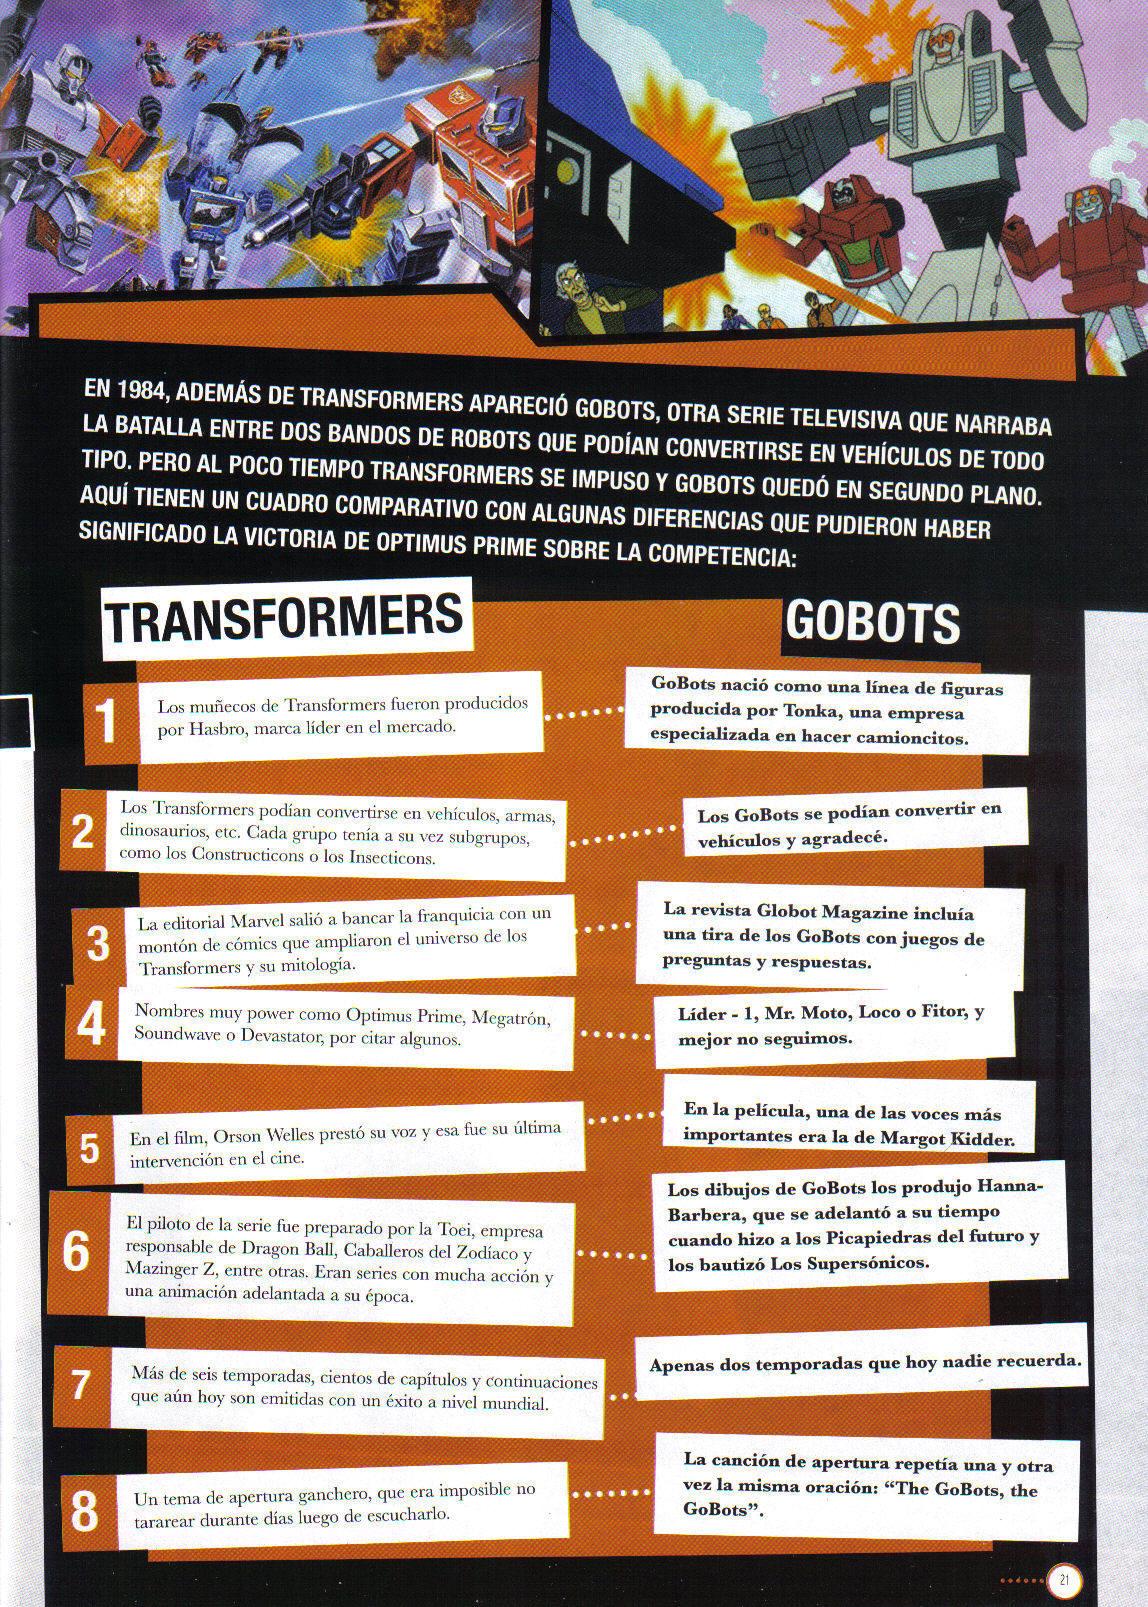 La Cosa ROTF Tfs Go Bots